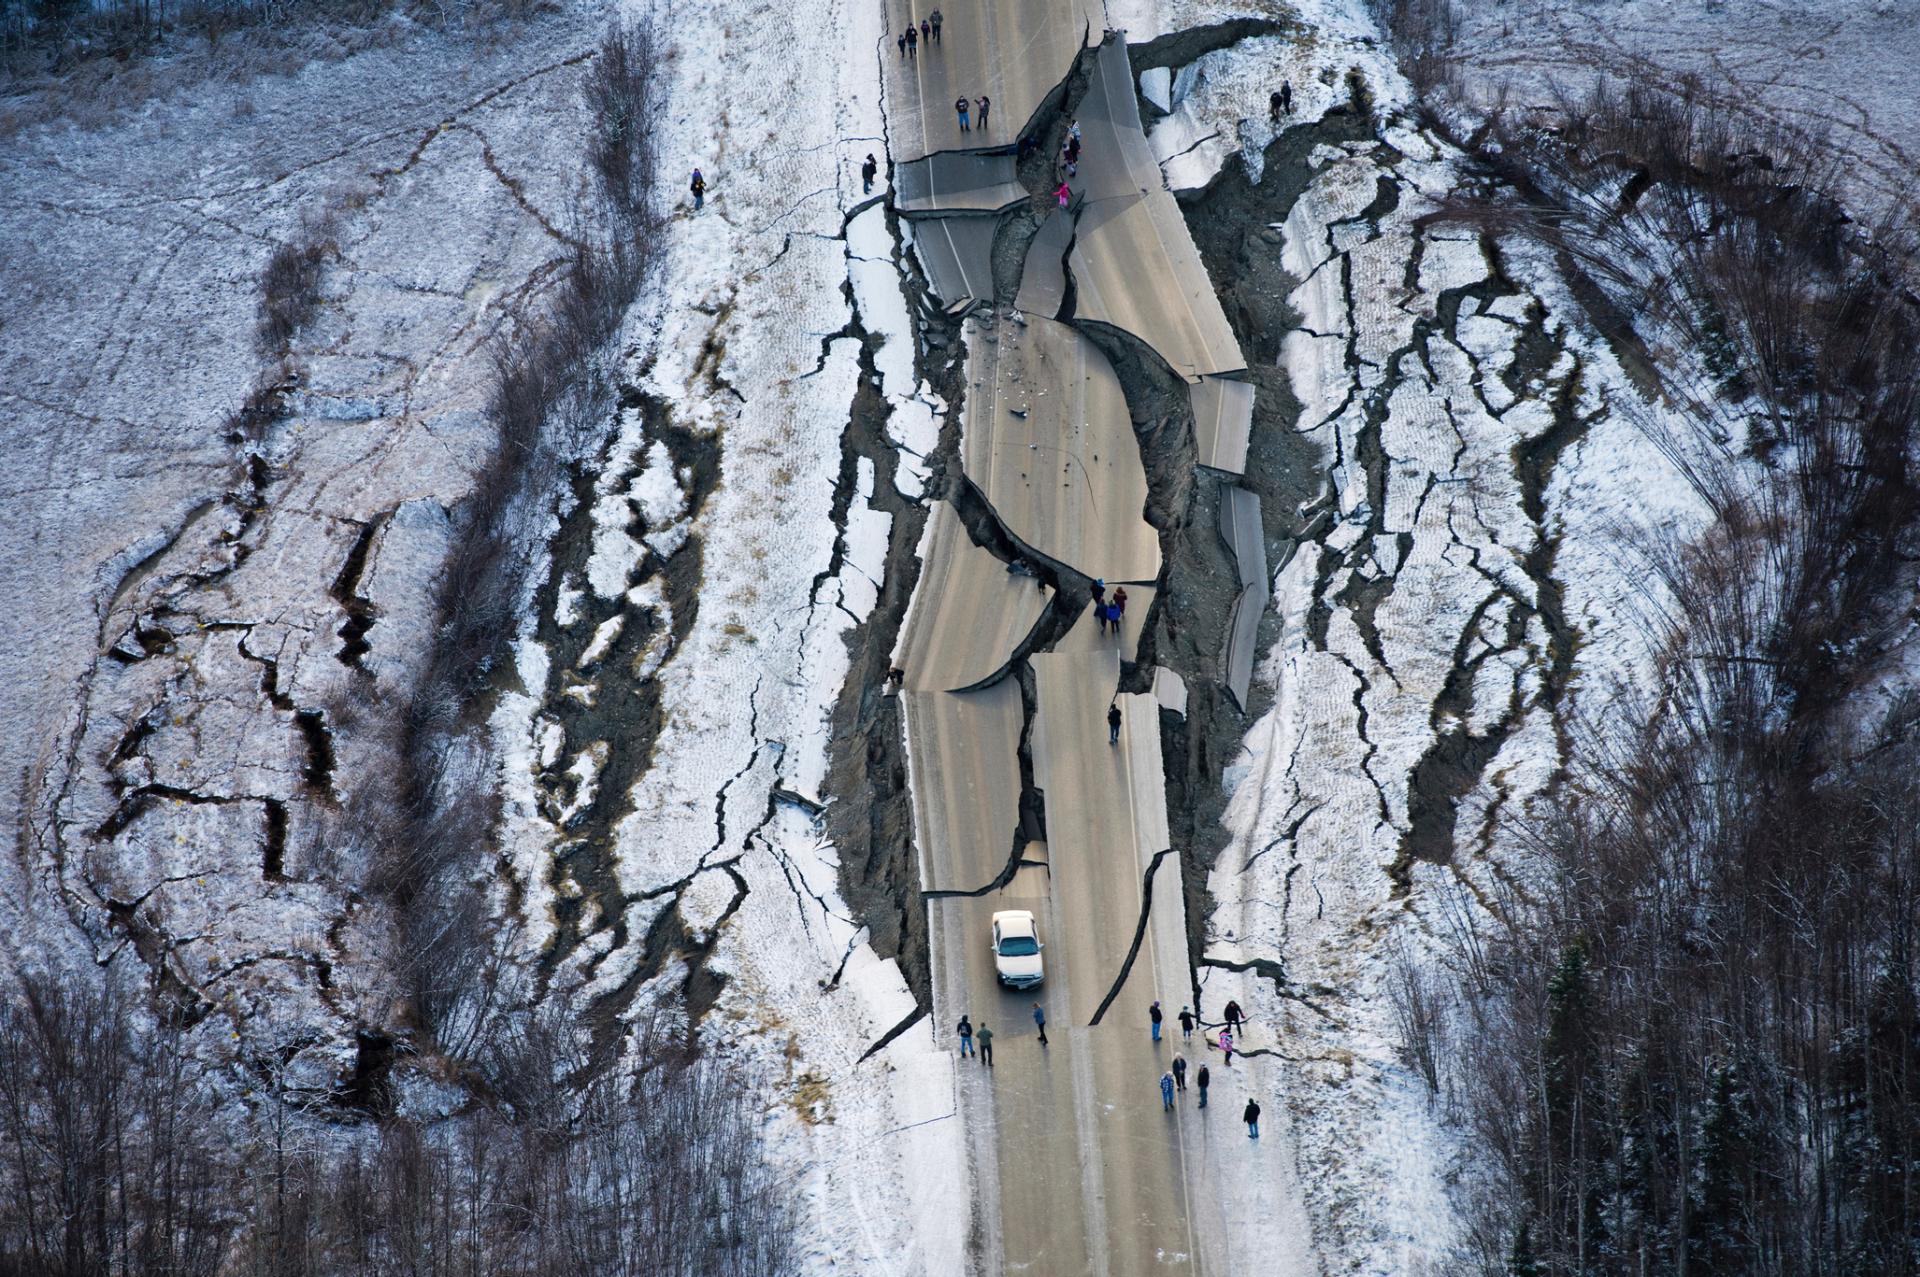 Hundreds of aftershocks shake Alaskans following big quake